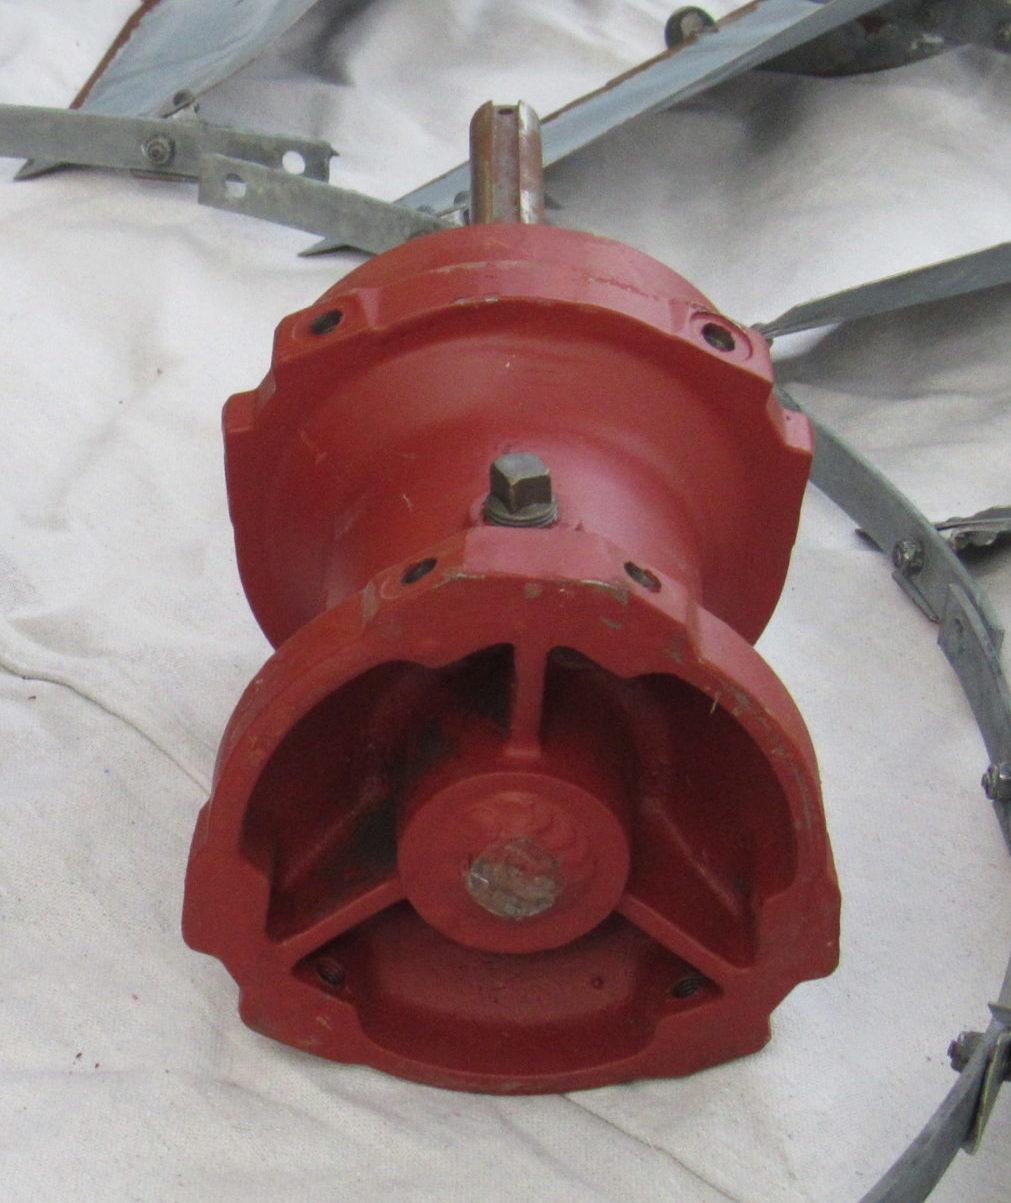 Modern Aermotor Red Hub (1965 - Present)